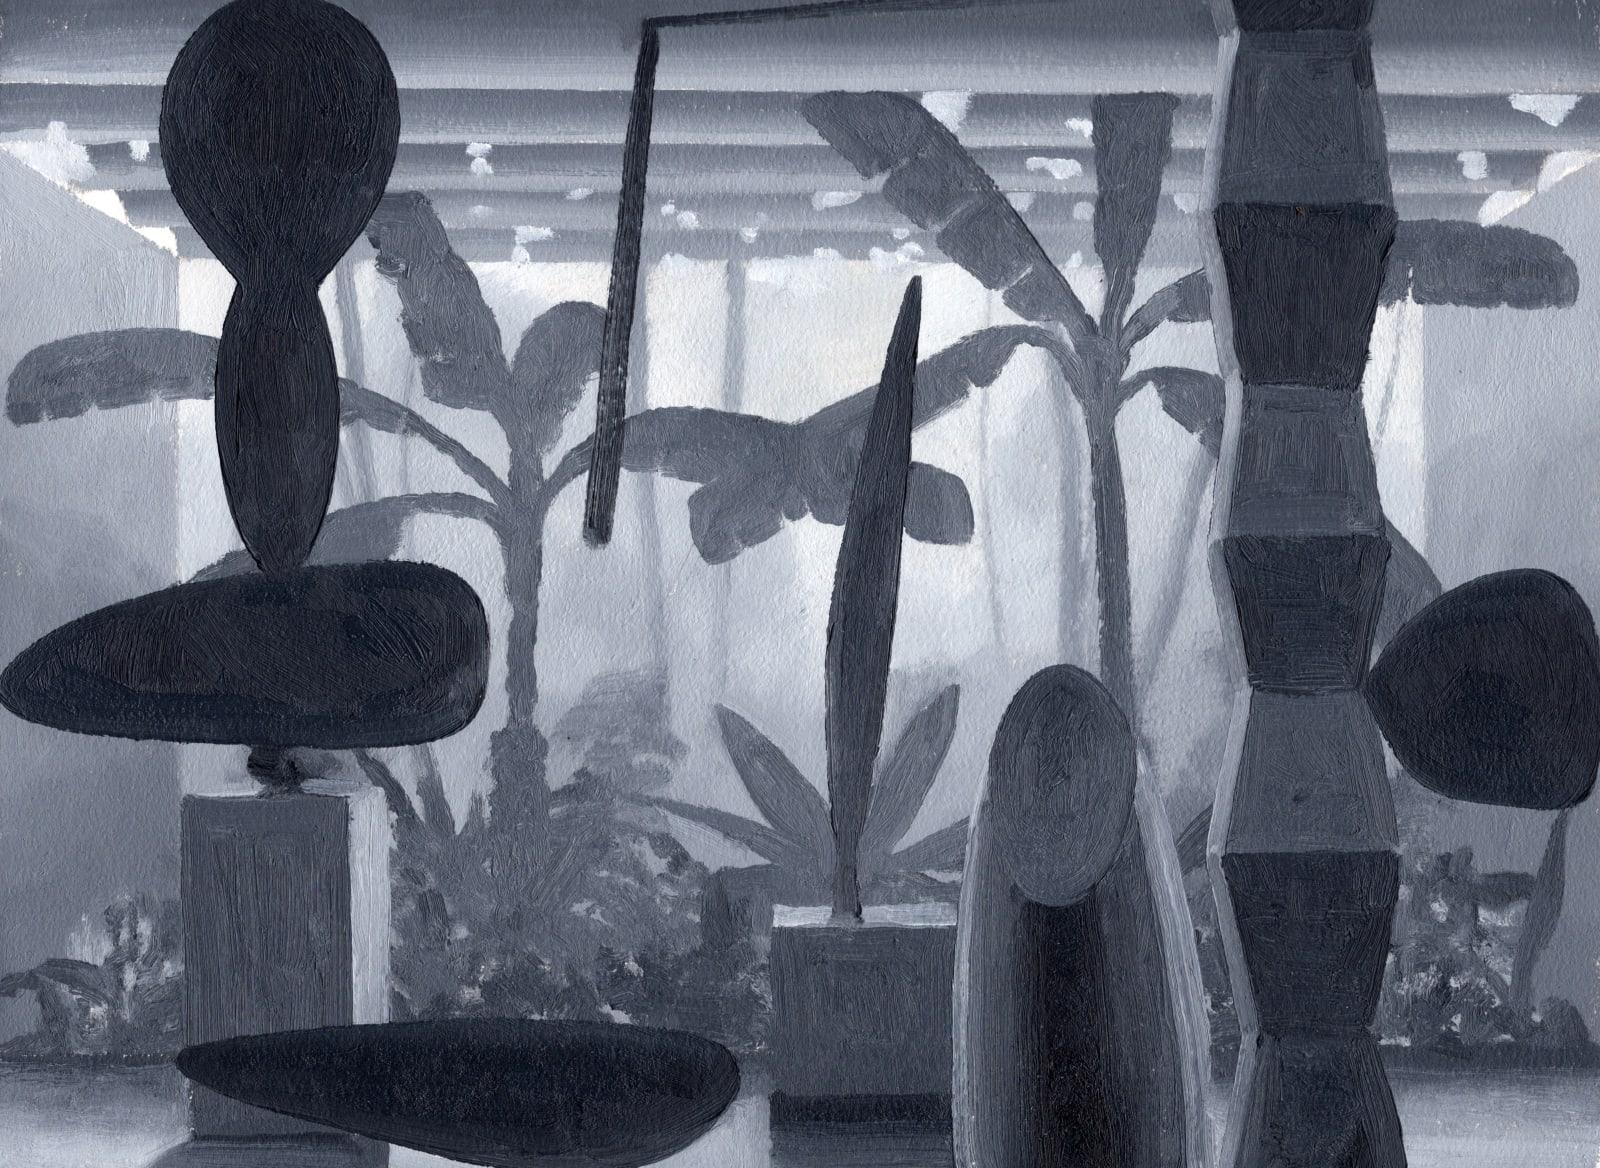 Daniel Dove Atrium #3 (Study), 2020 Oil on paper, unframed 12 1/4 x 16 1/8 in 31.1 x 41 cm